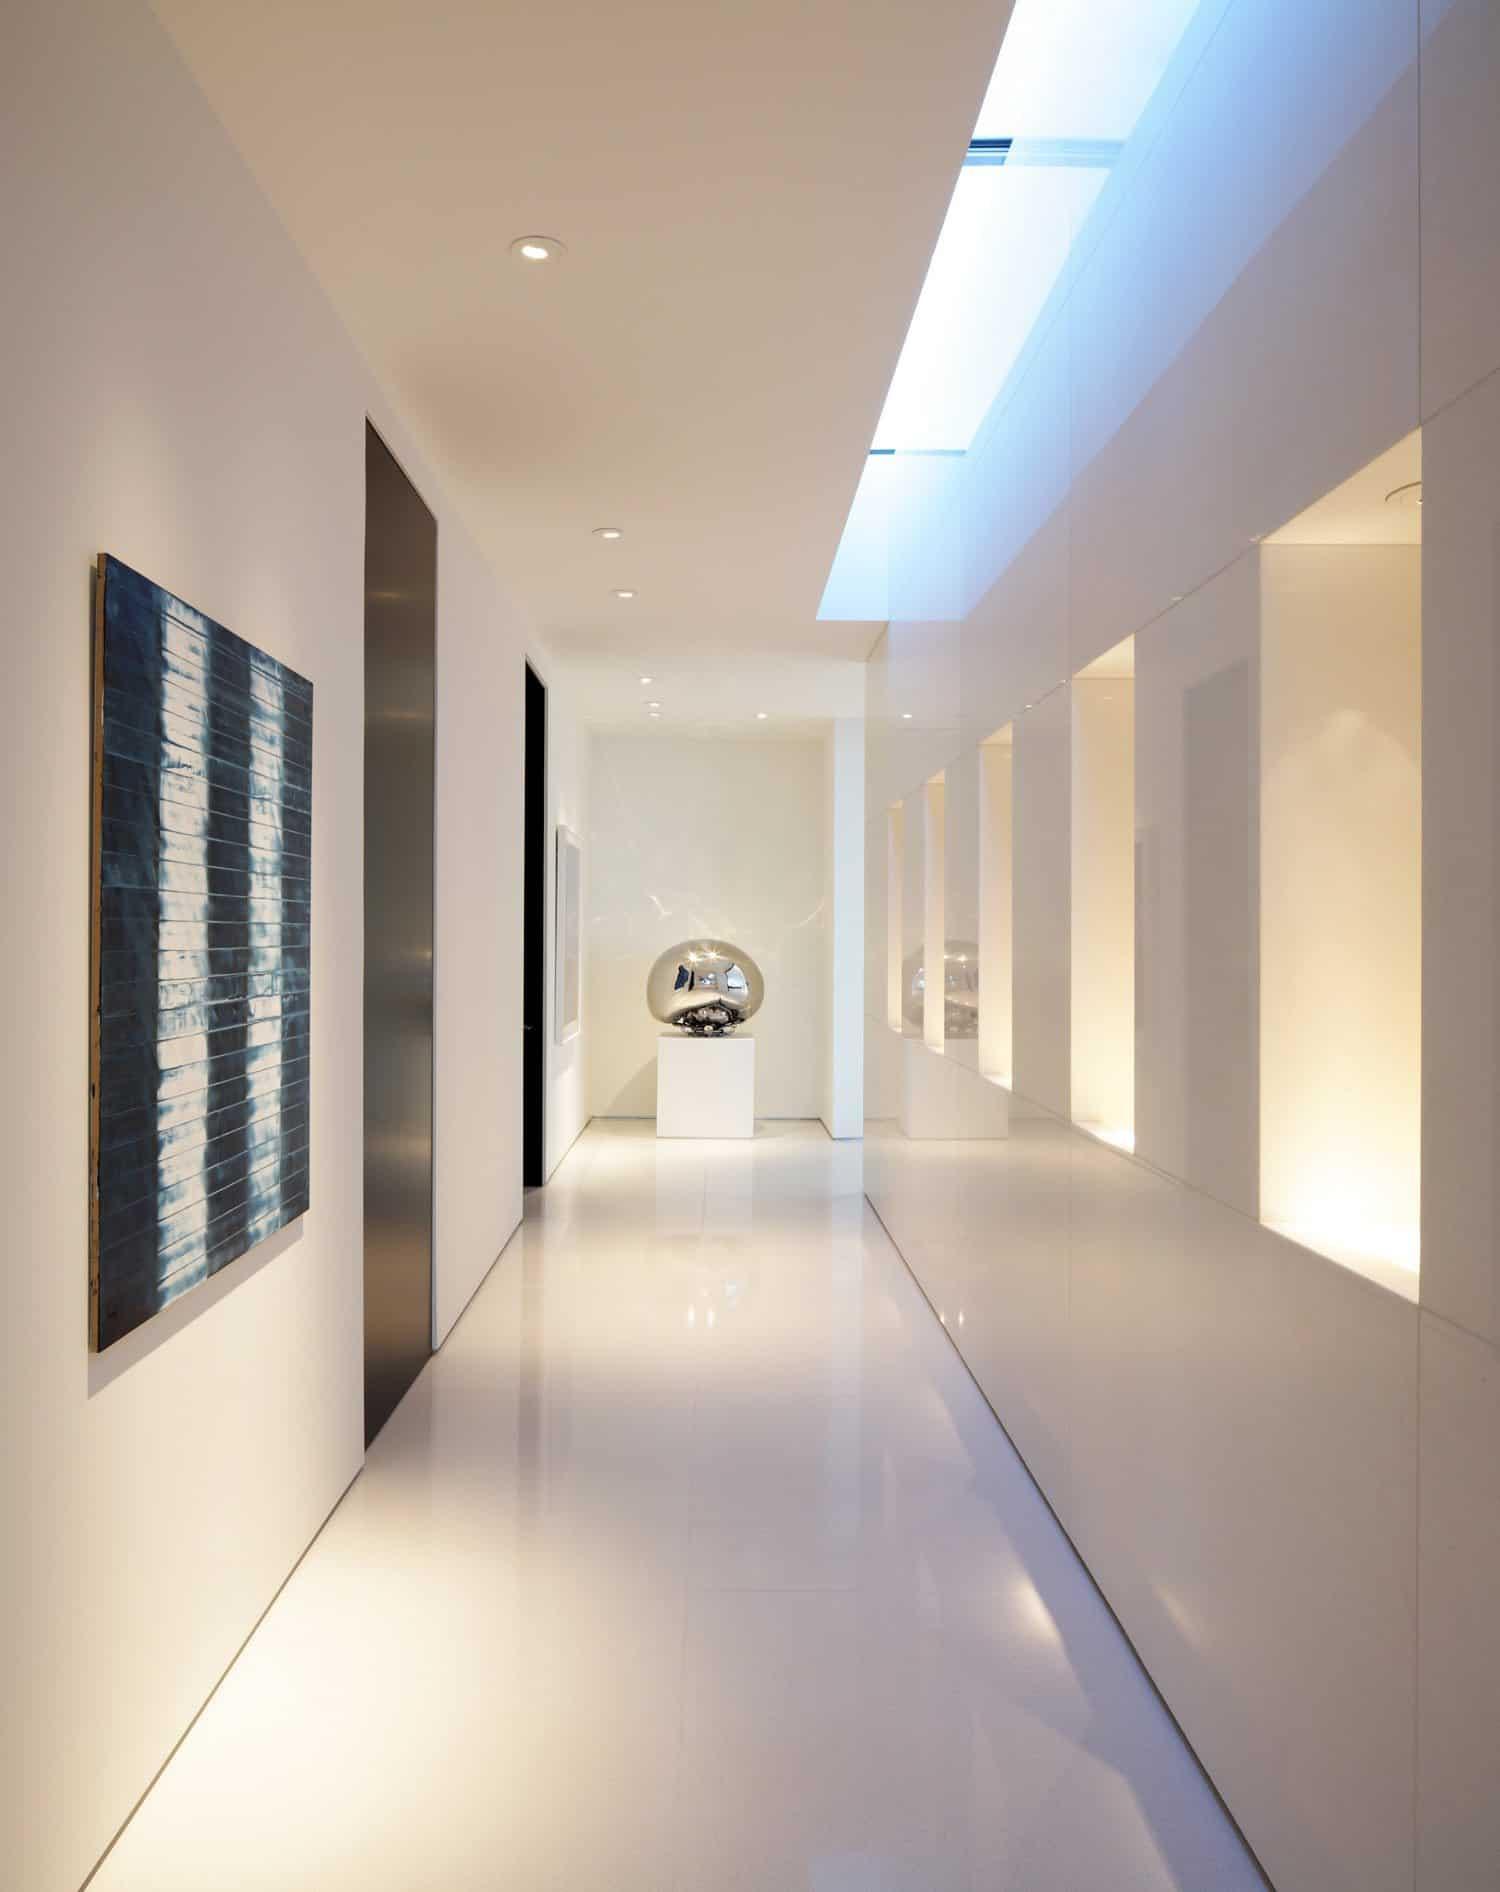 Modern-Residence-Architecture-Magni Design-21-1 Kindesign